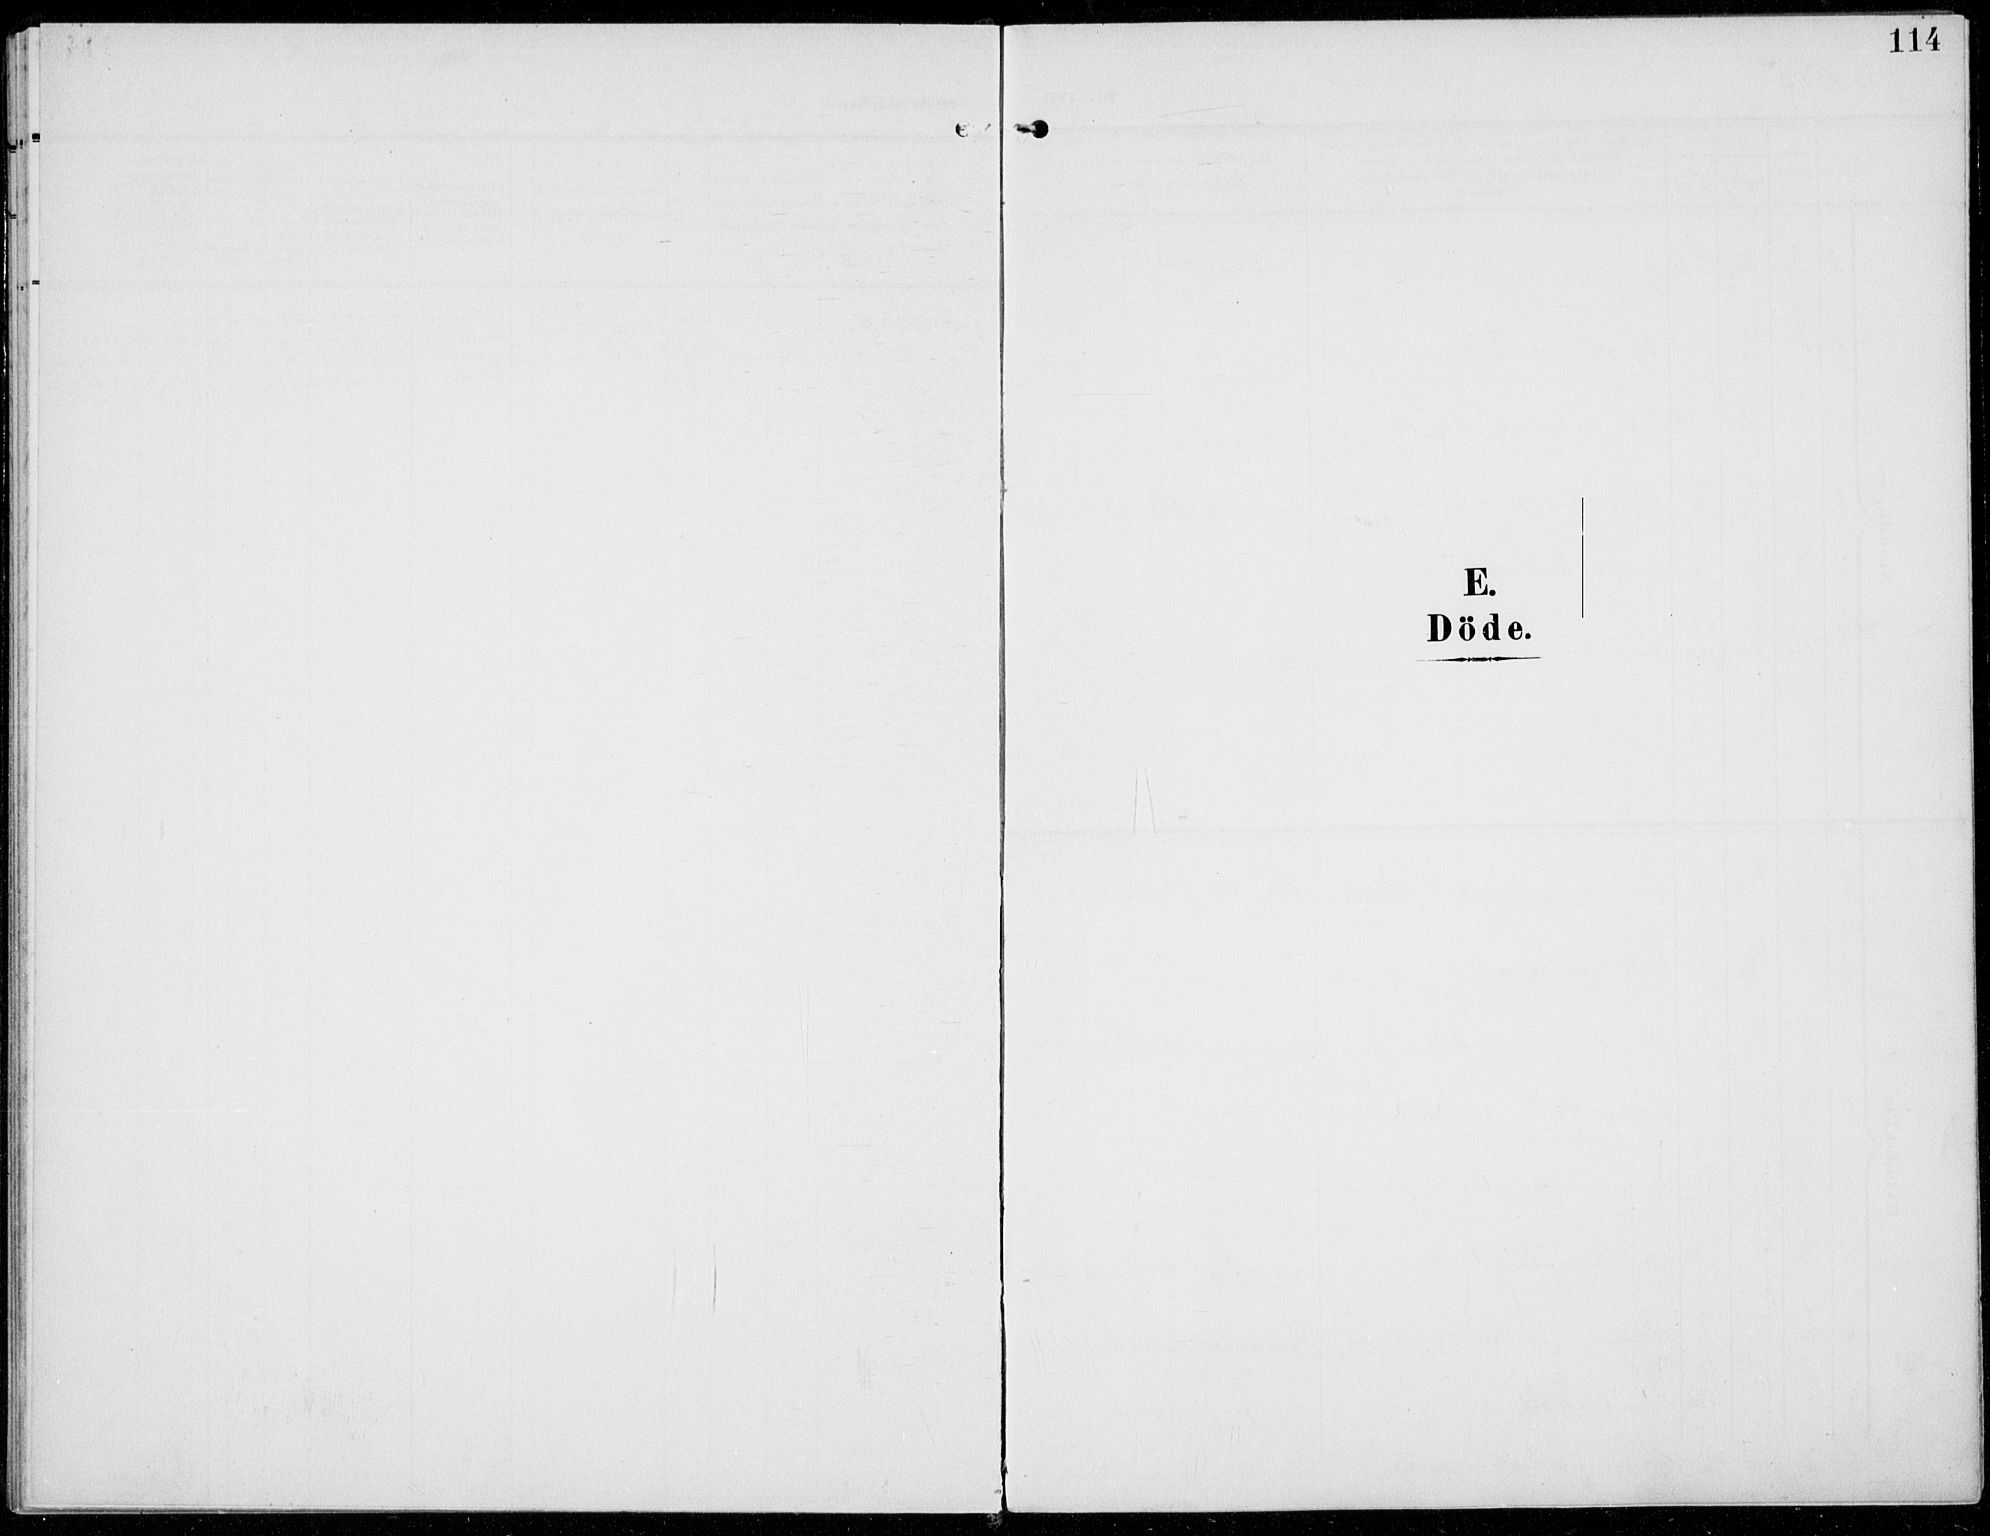 SAH, Sel prestekontor, Parish register (official) no. 1, 1905-1922, p. 114